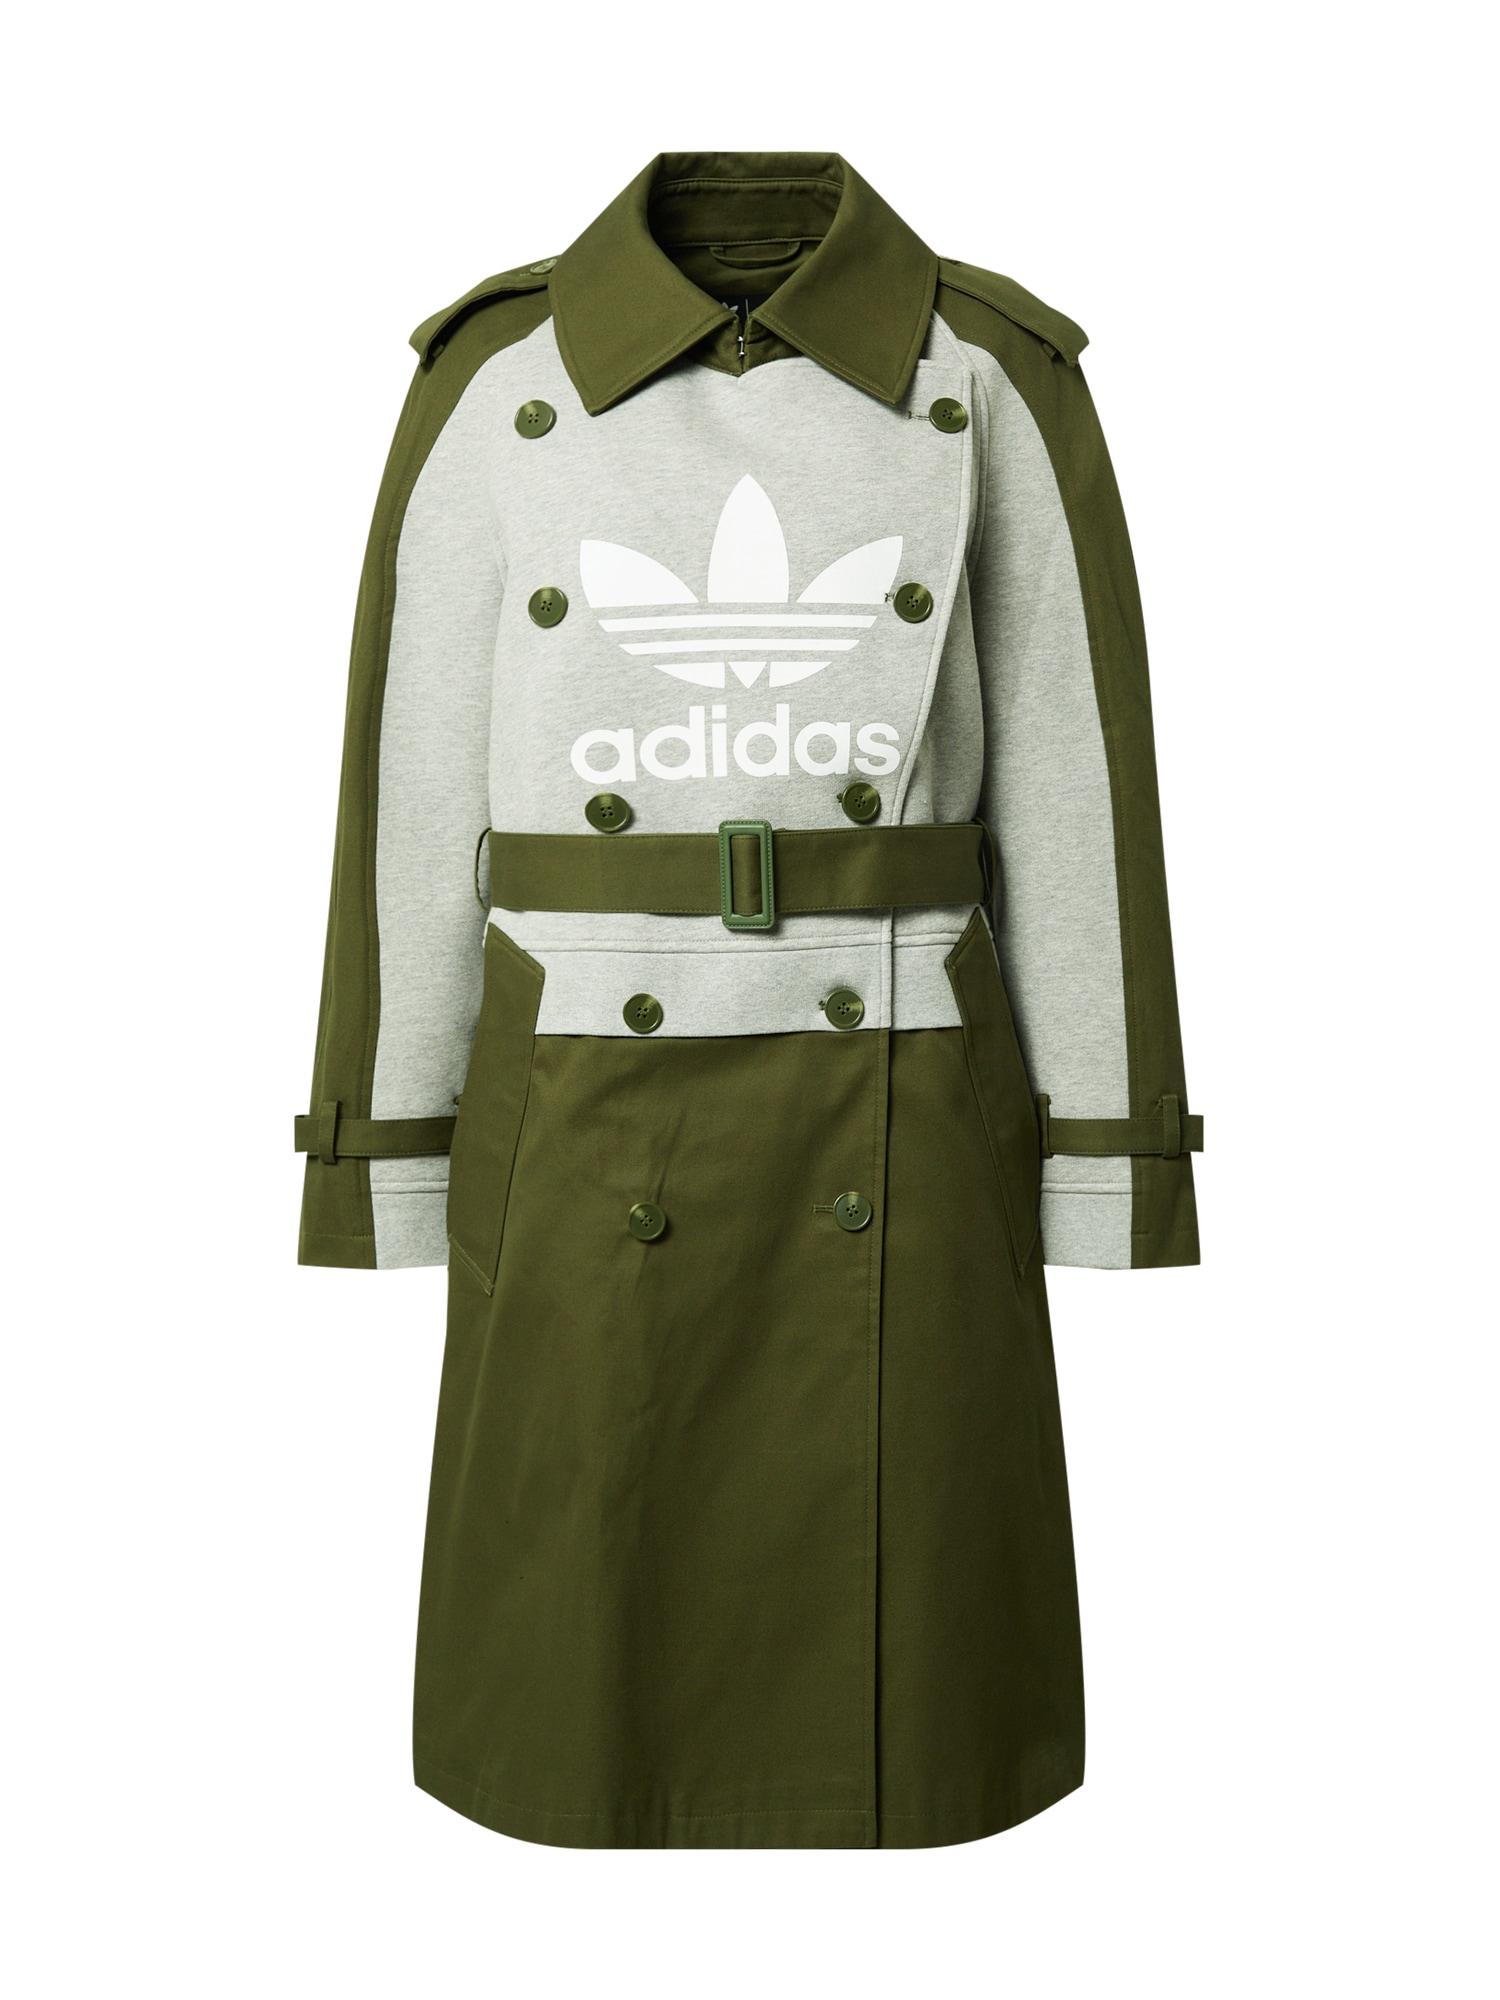 ADIDAS ORIGINALS Demisezoninis paltas alyvuogių spalva / margai pilka / balta